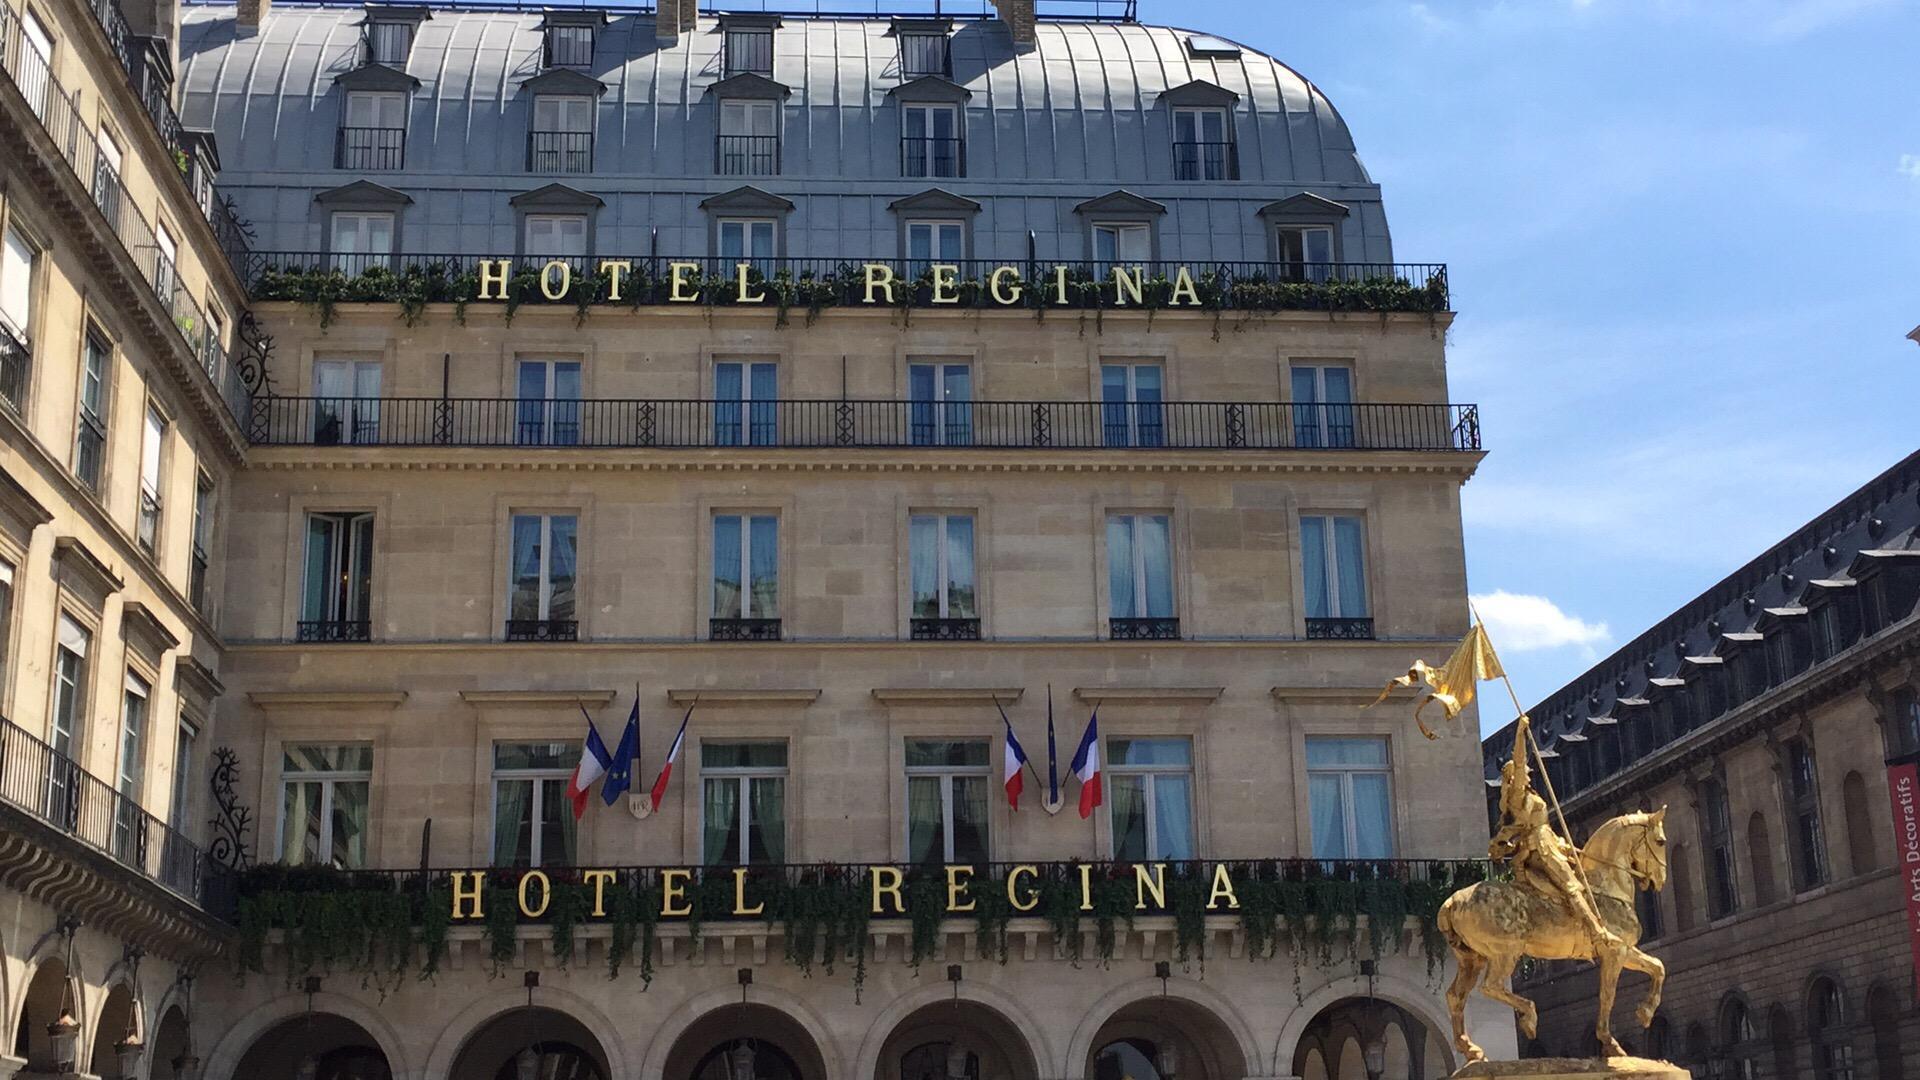 Hotel Regina across the Place de Pyramides